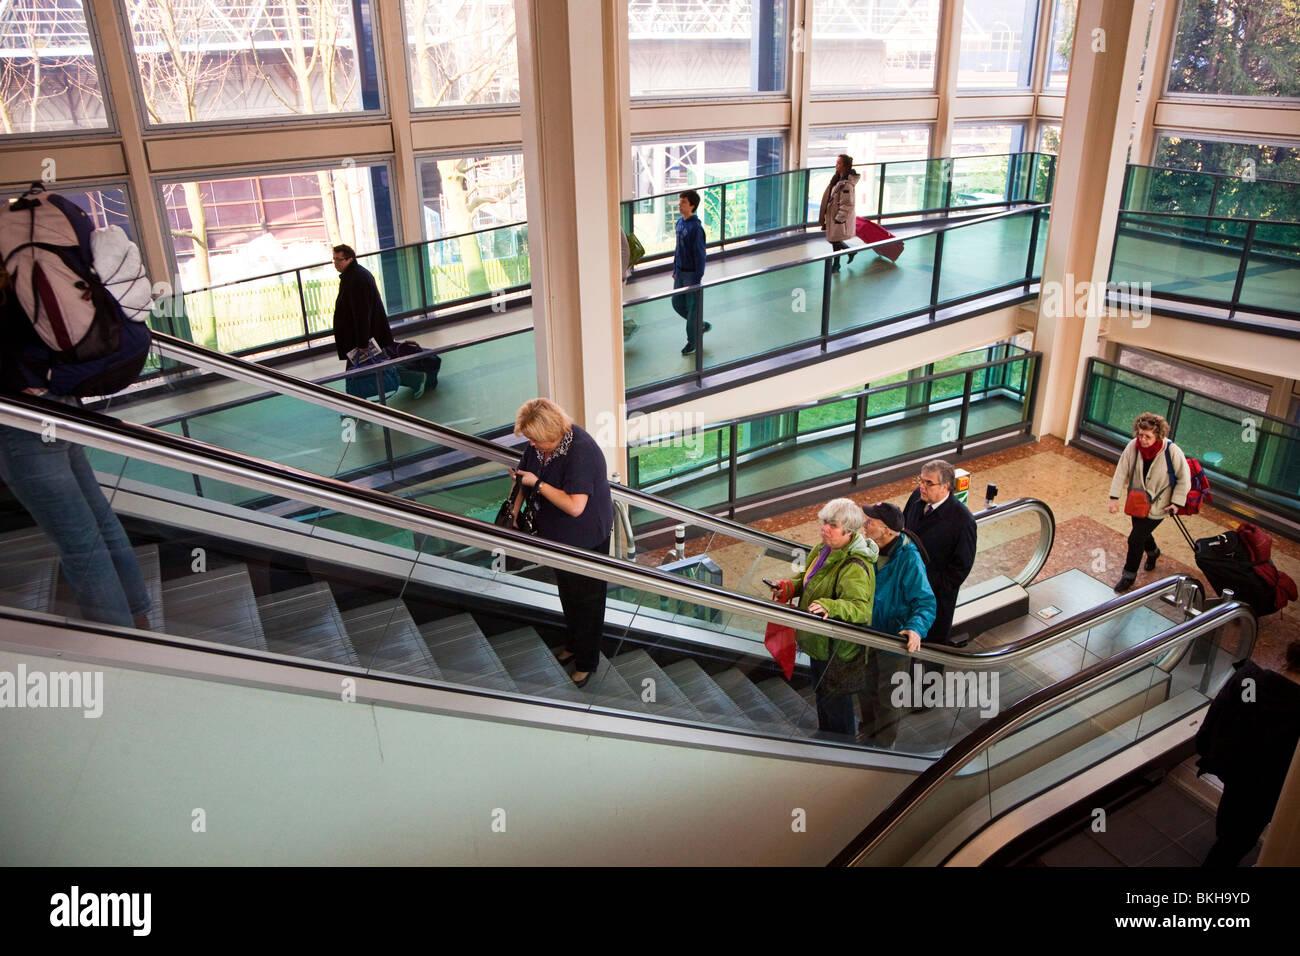 People on ramp and escalator at Gatwick airport England UK - Stock Image